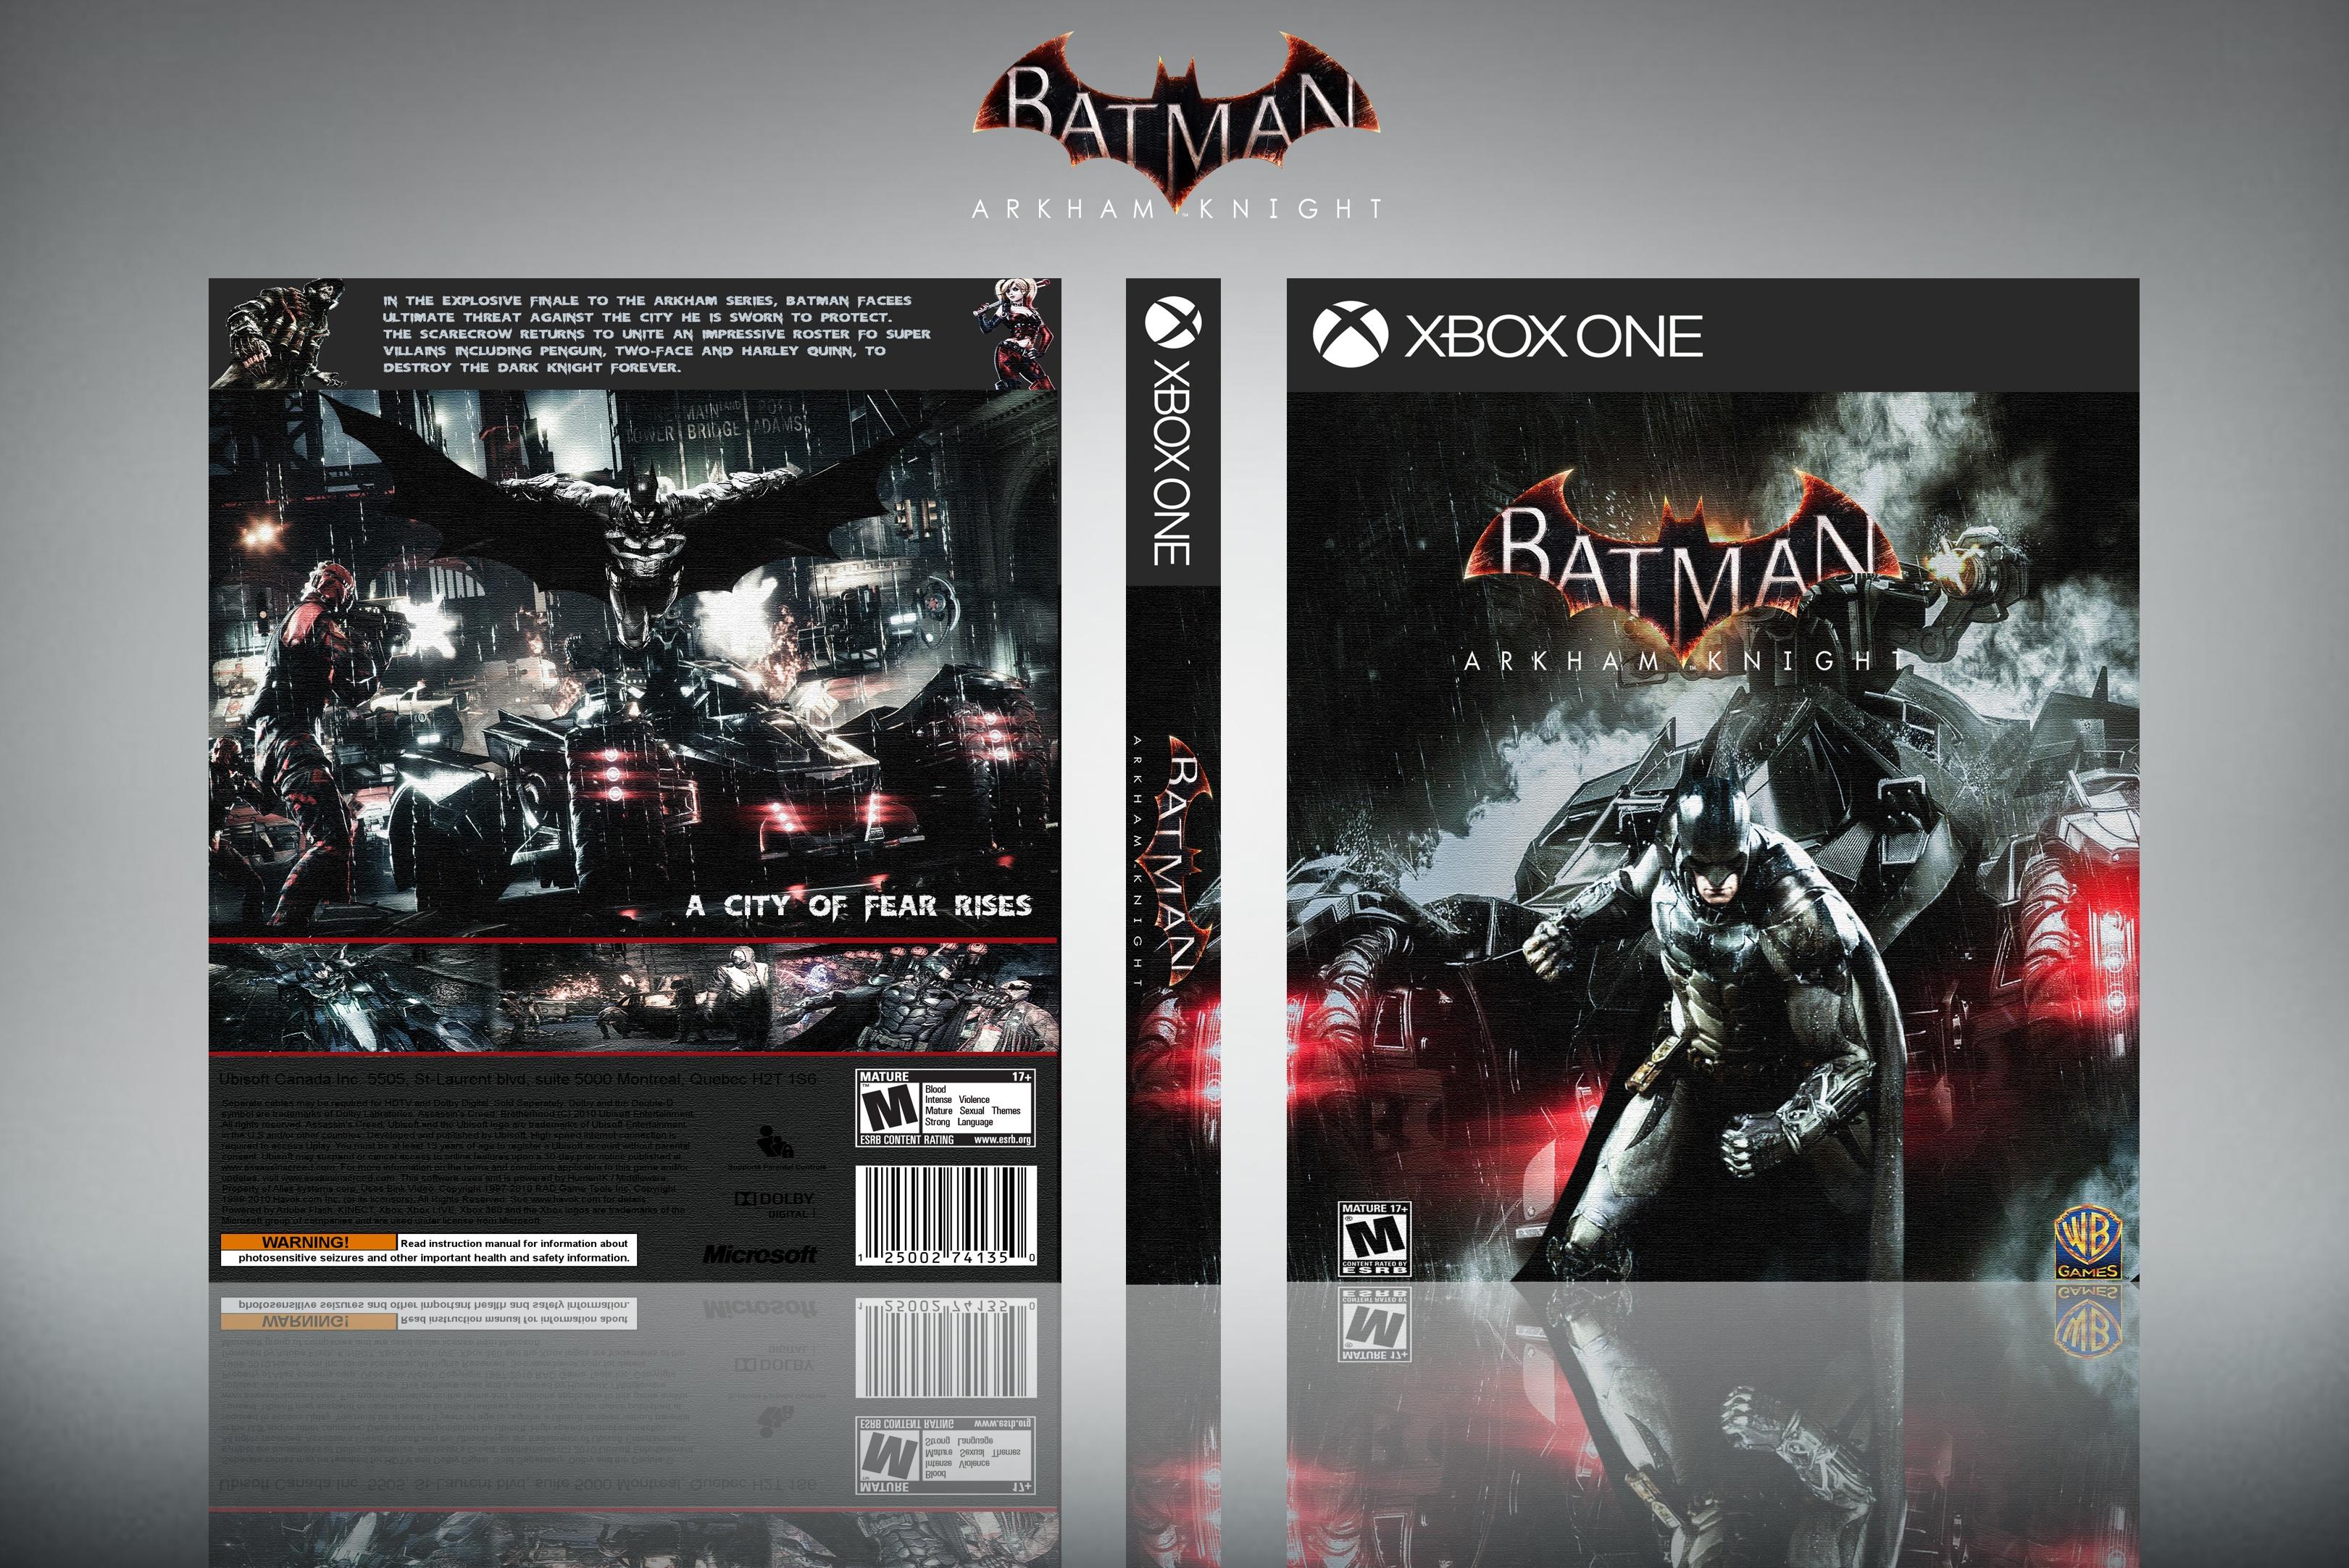 Batman Arkham Knight Xbox One Box Art Cover by edward91